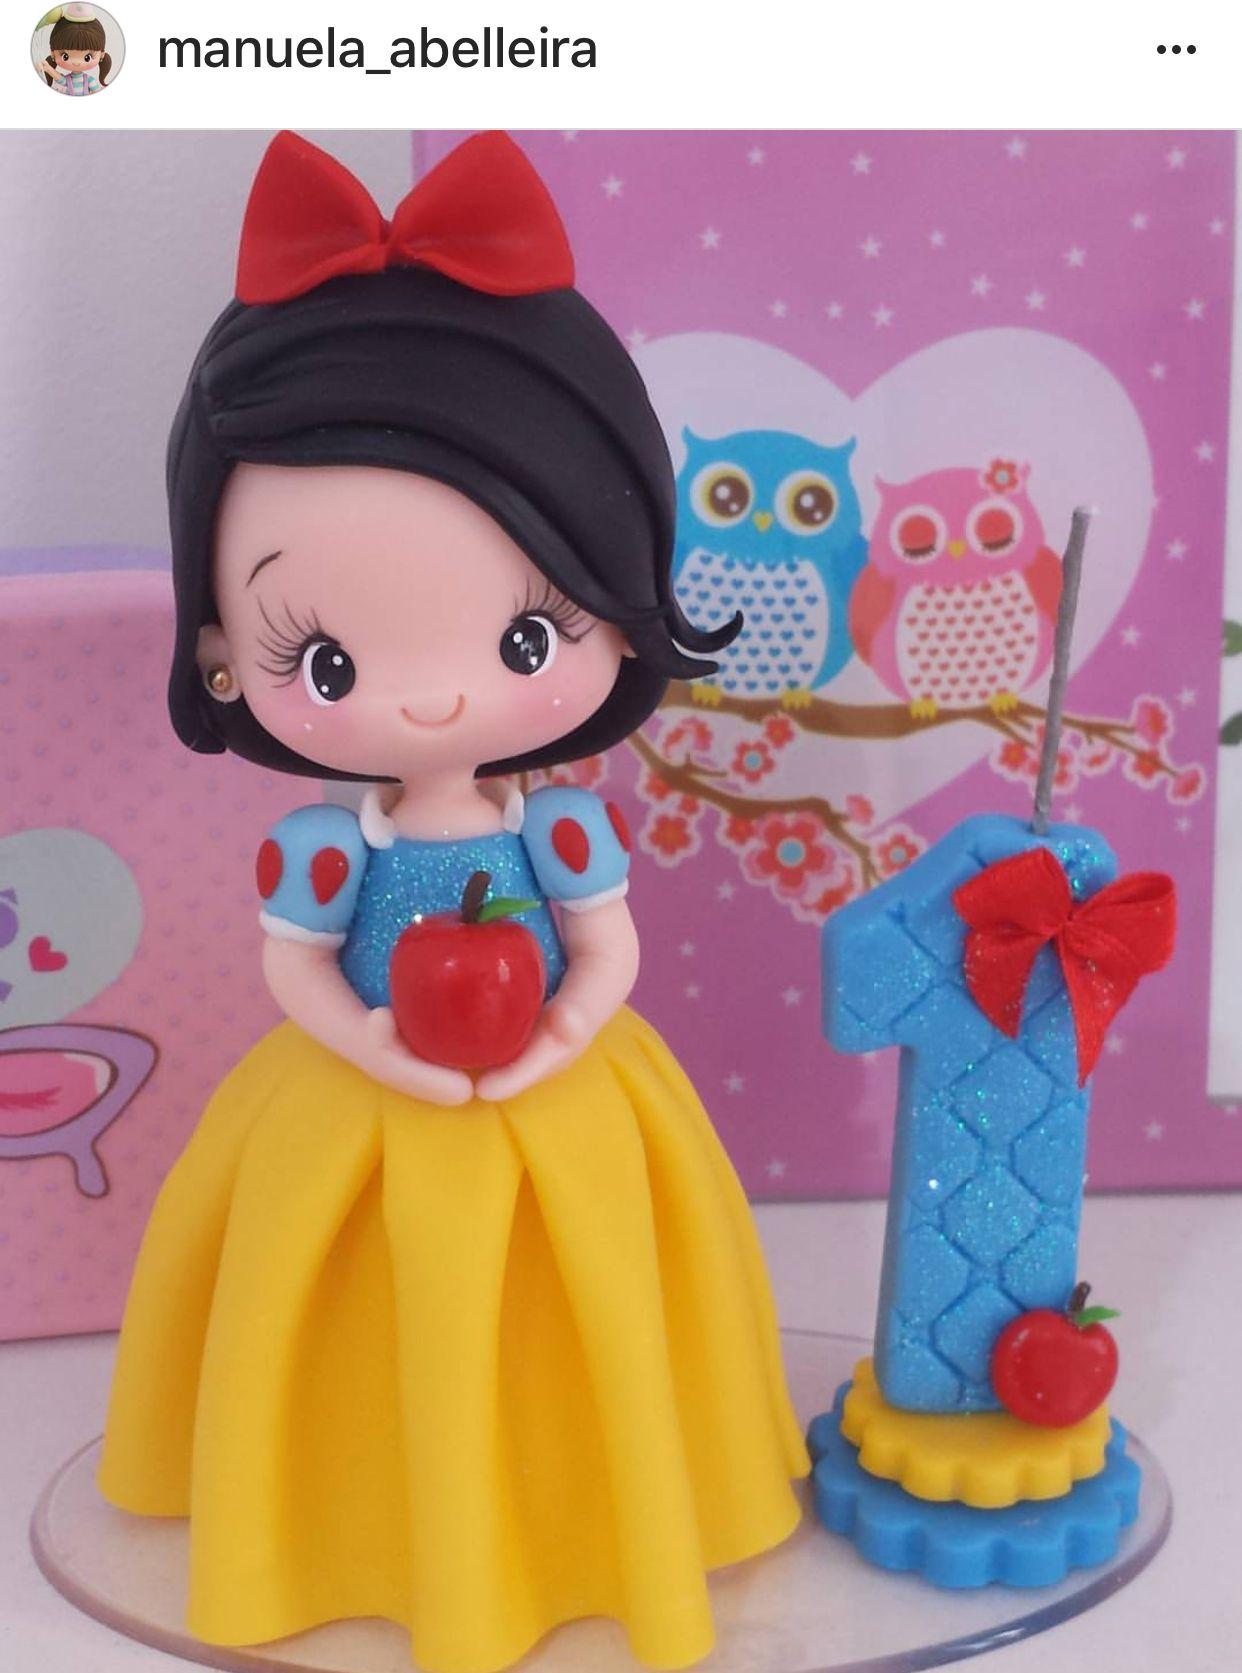 Pin By Shelly Wing On Craft Ideas Torta Blancanieves Cumplea 241 Os De Blanca Nieves